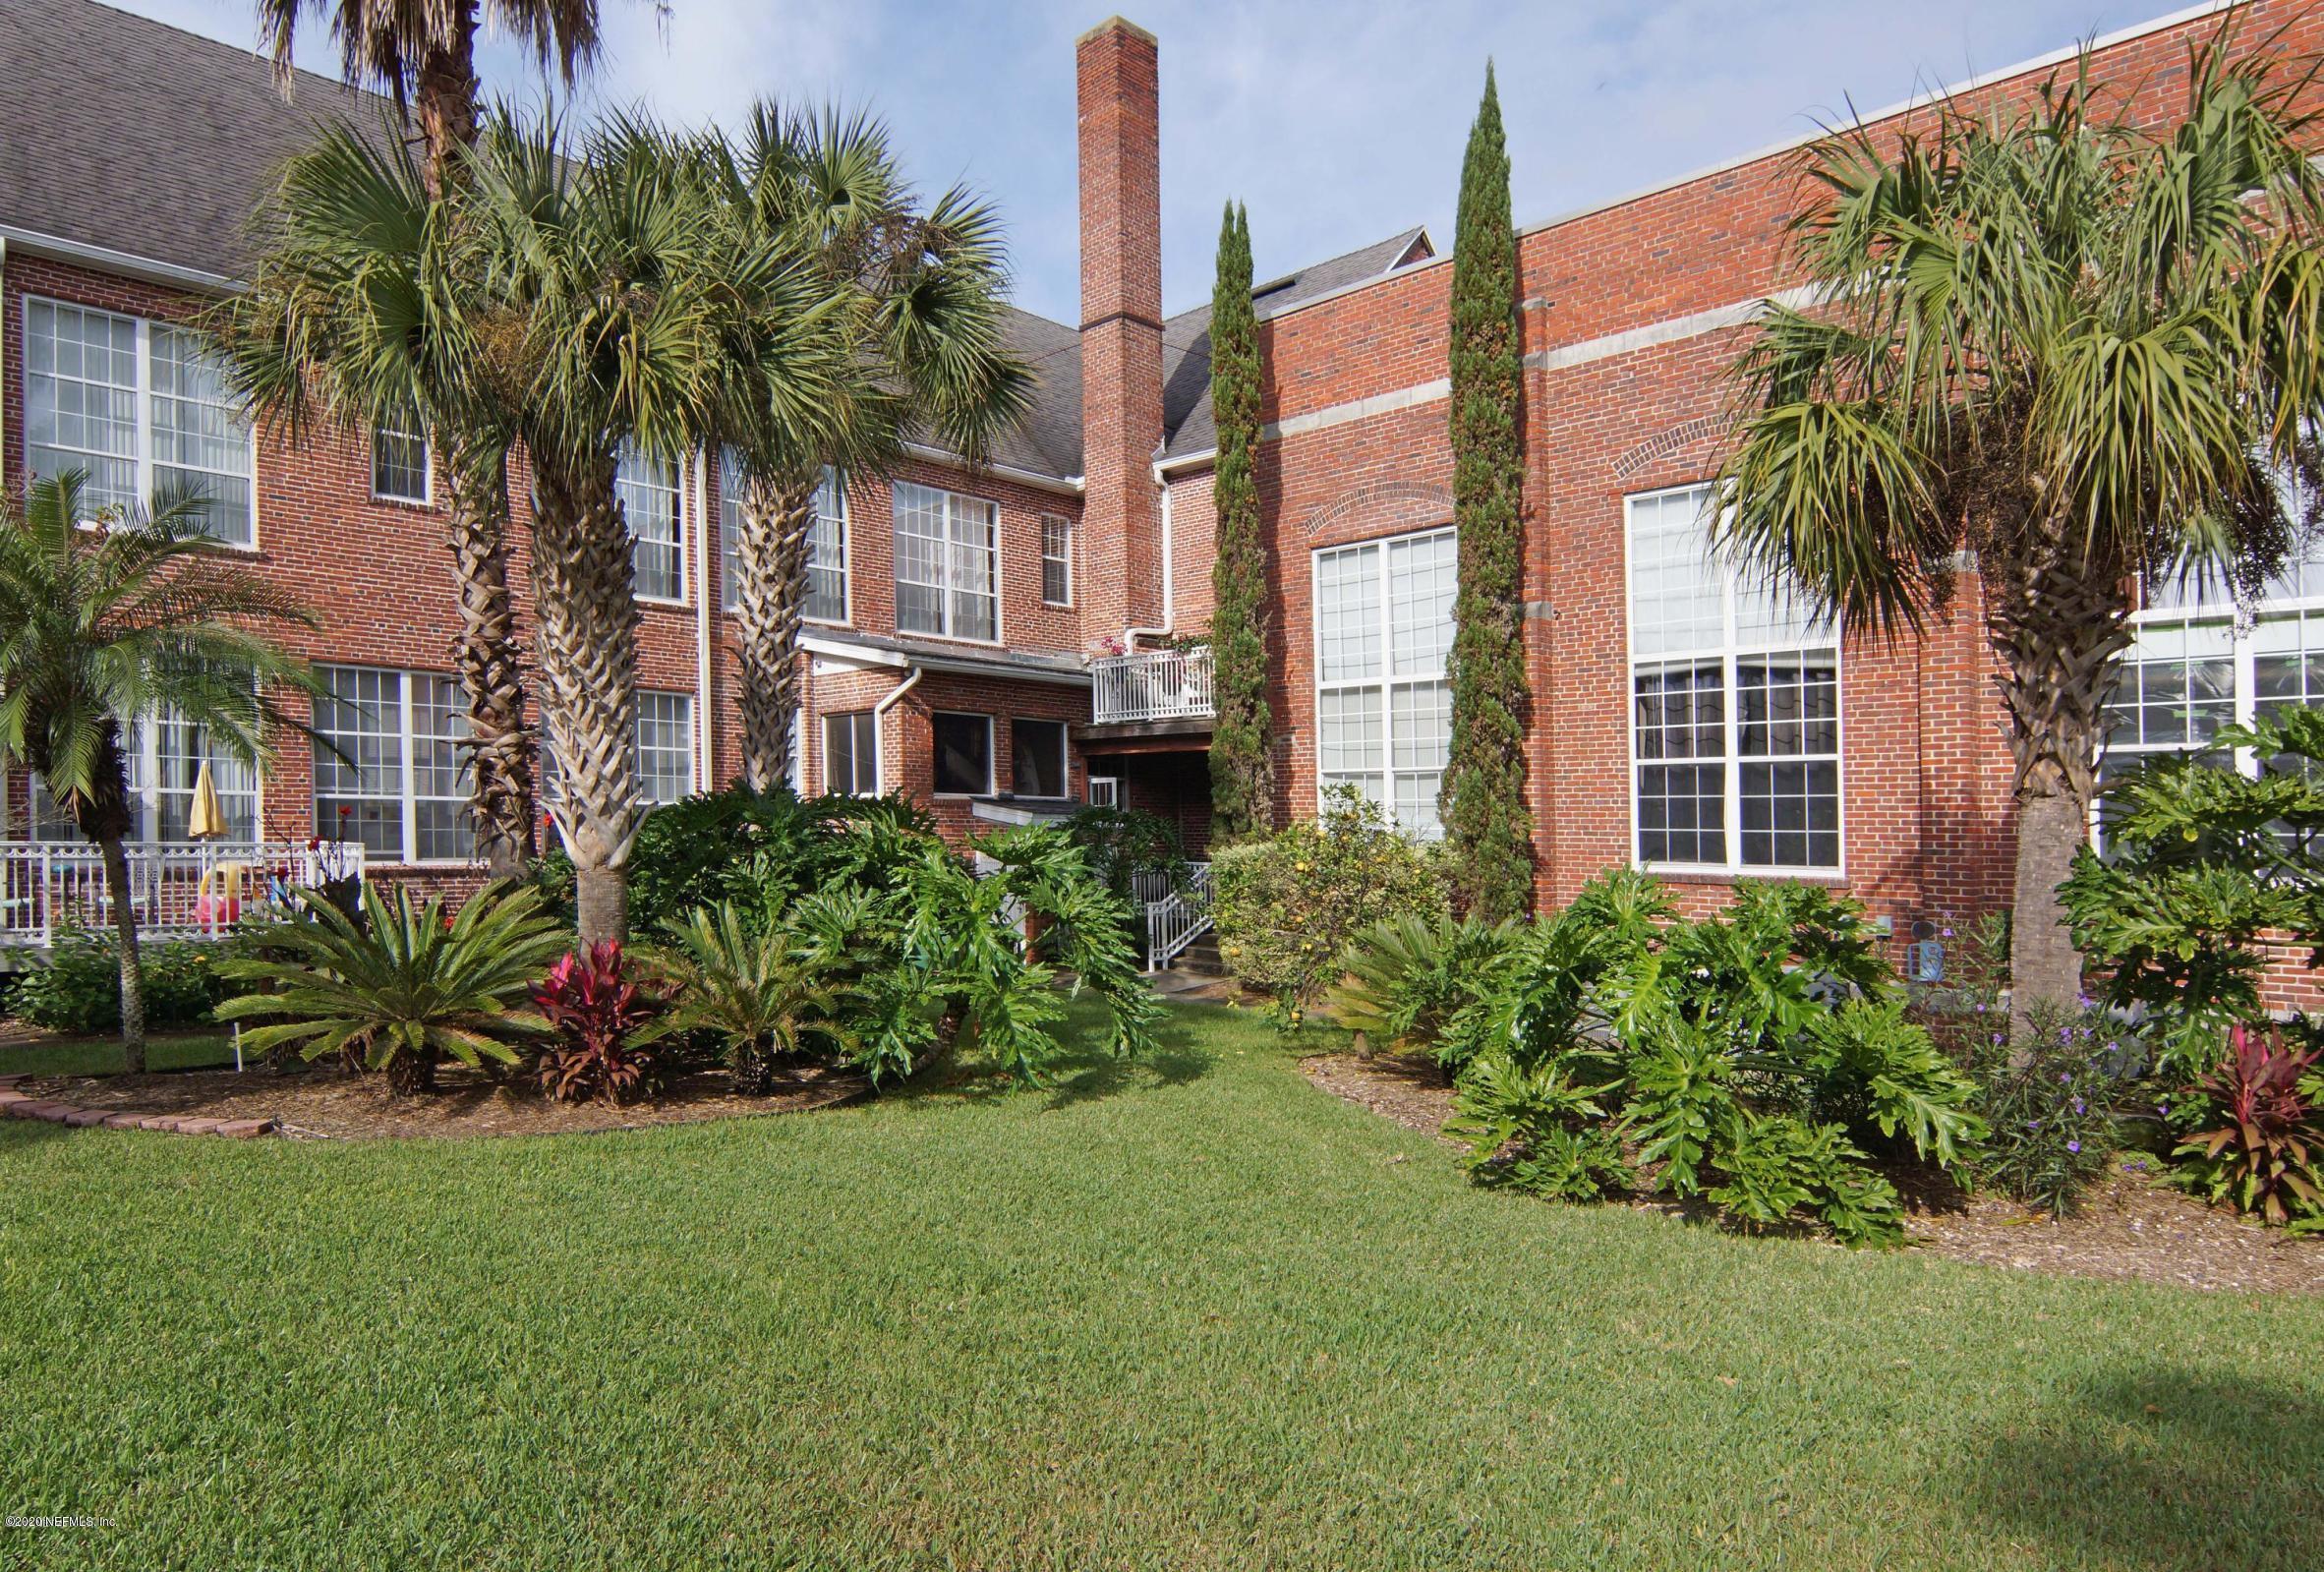 1951 MARKET, JACKSONVILLE, FLORIDA 32206, 1 Bedroom Bedrooms, ,1 BathroomBathrooms,Residential,For sale,MARKET,1079825